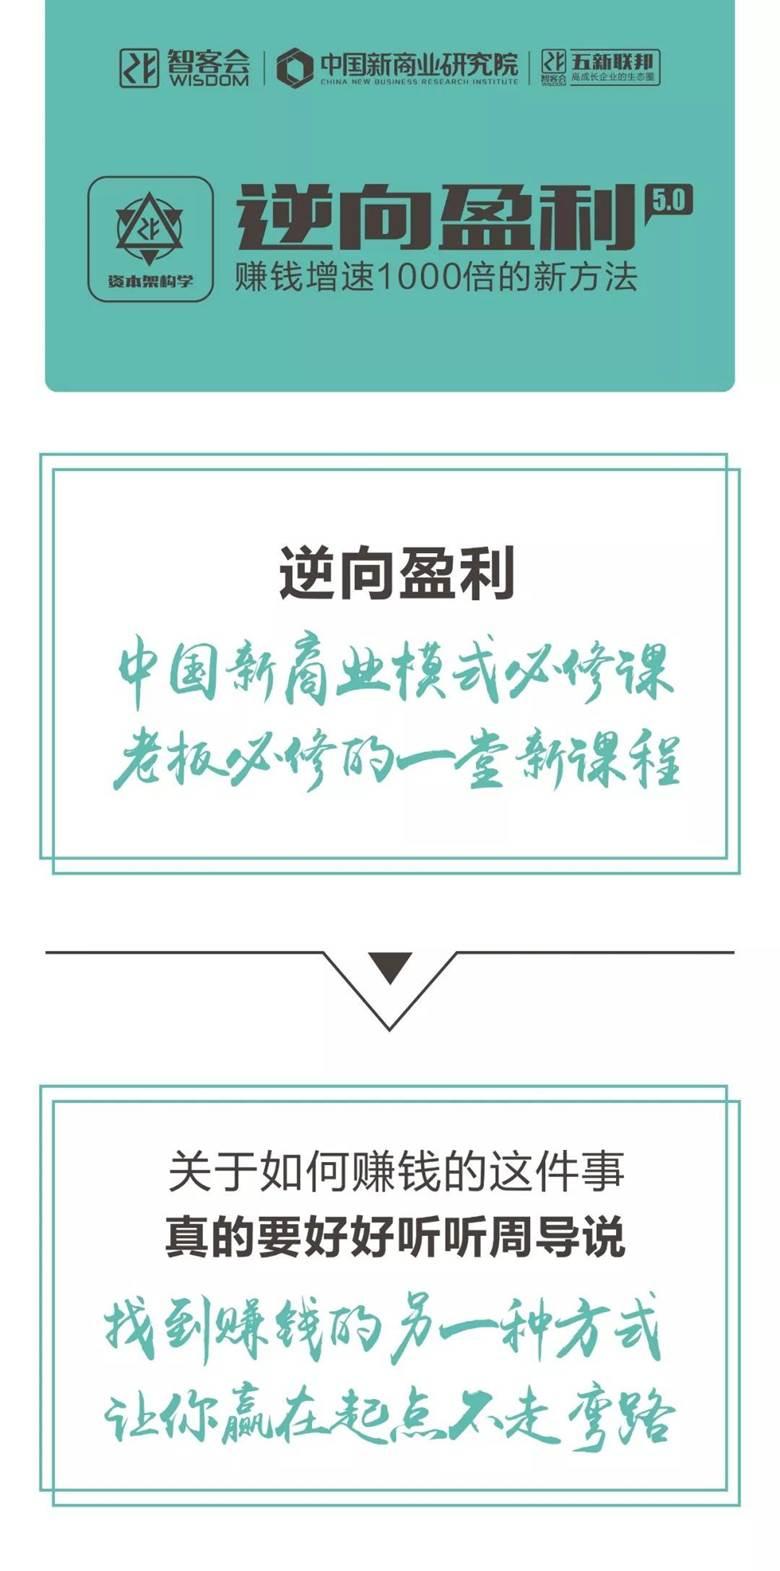 http://www.huodongxing.com/file/20191113/1063603644976/483660701210454.jpeg